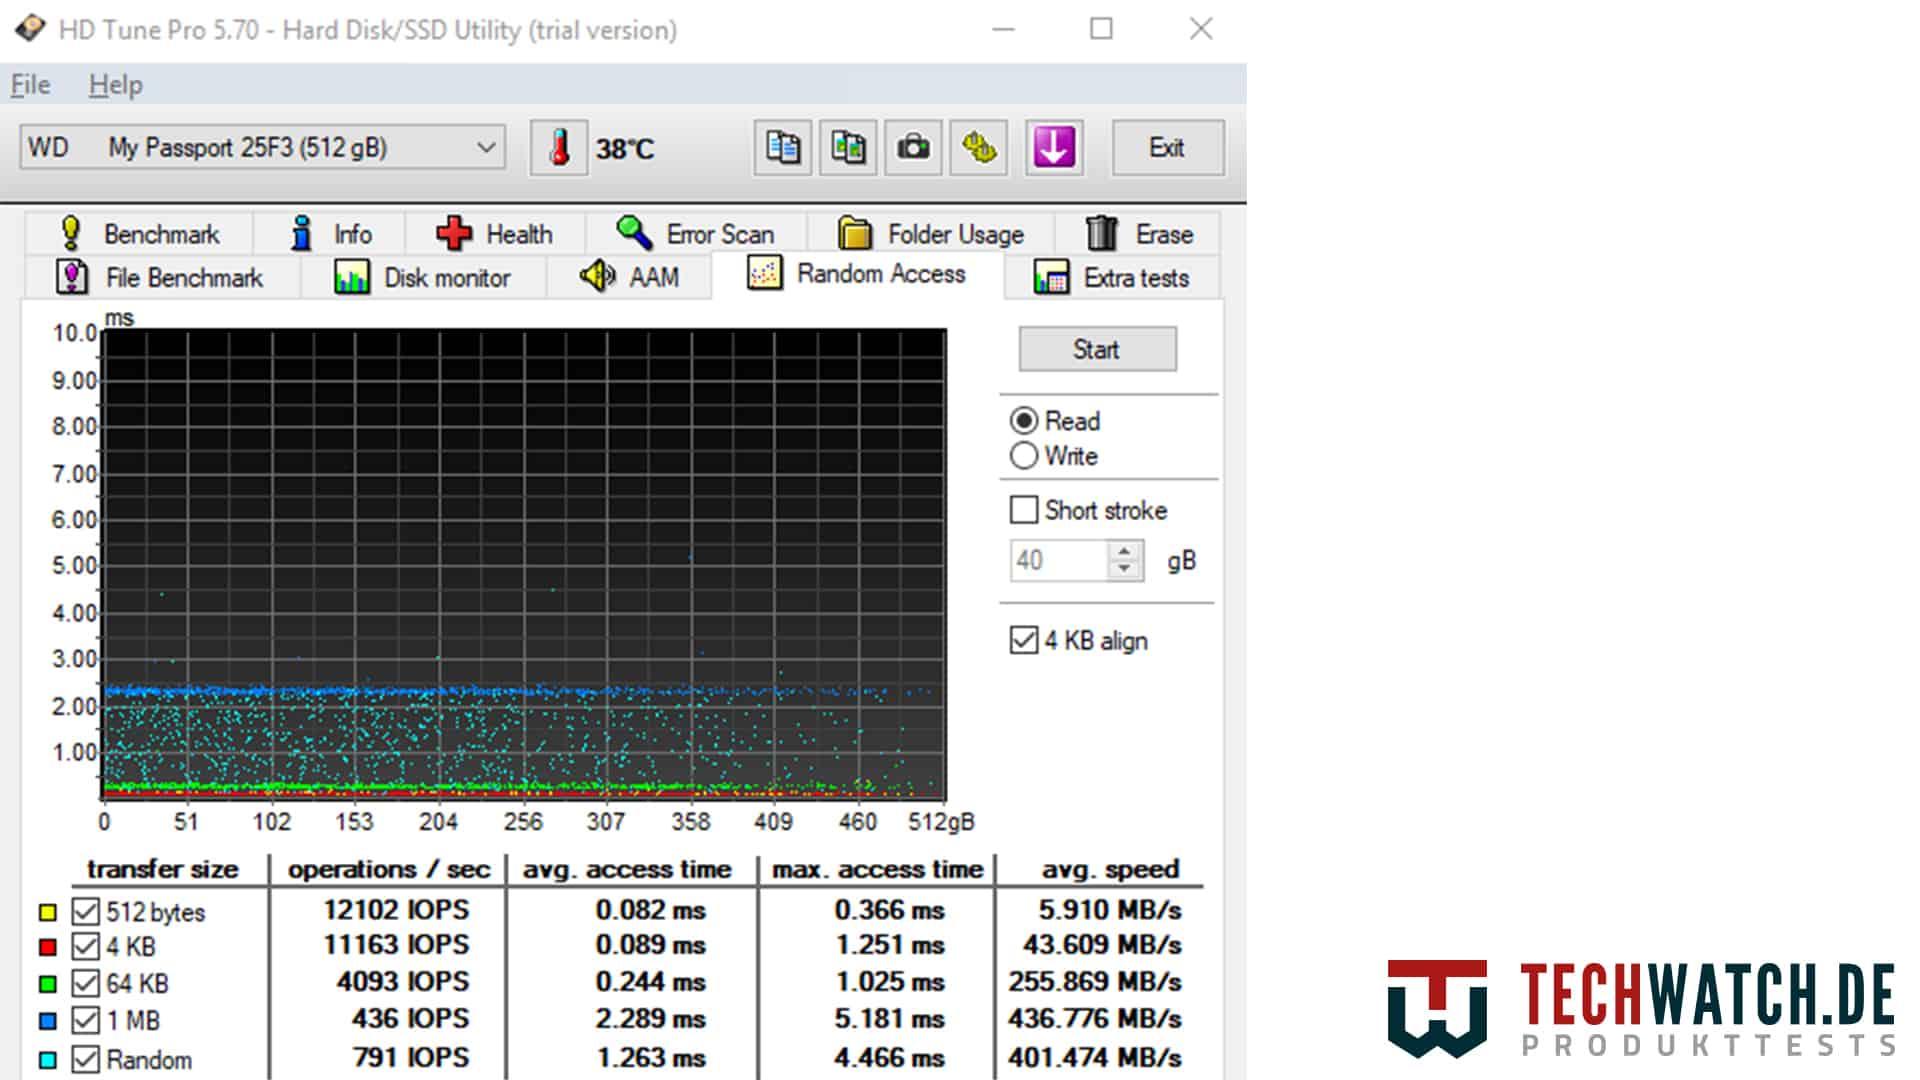 WD MyPassport SSD HD Tune Pro